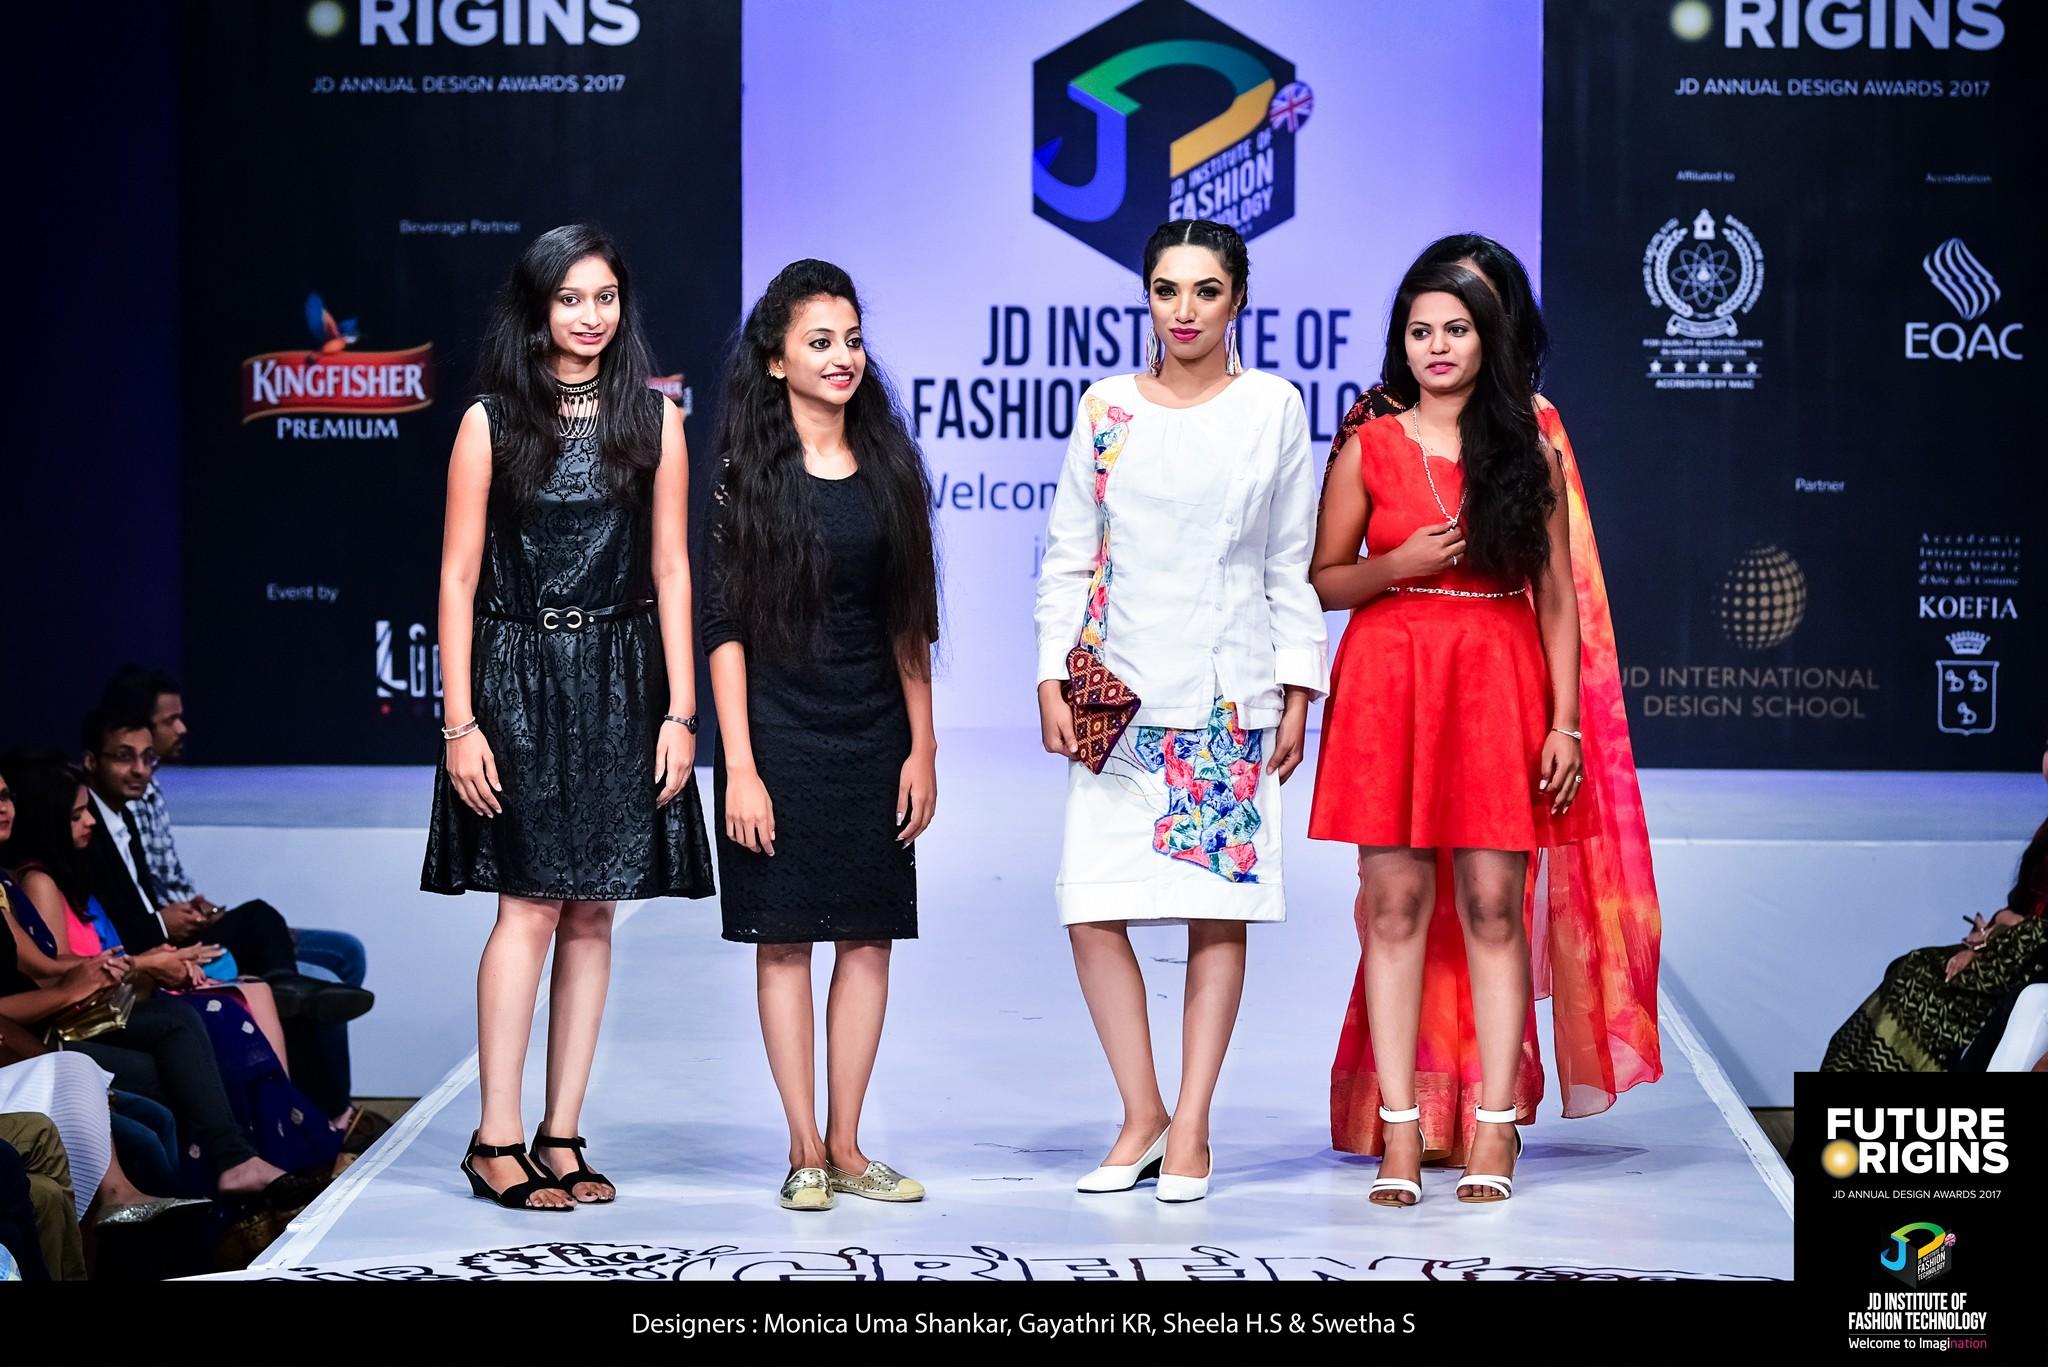 White Fresco - Future Origin - JD Annual Design Awards 2017 | Photography : Jerin Nath (@jerin_nath) white fresco - White Fresco     Future Origin     JD Annual Design Awards 2017 4 - White Fresco – Future Origin – JD Annual Design Awards 2017